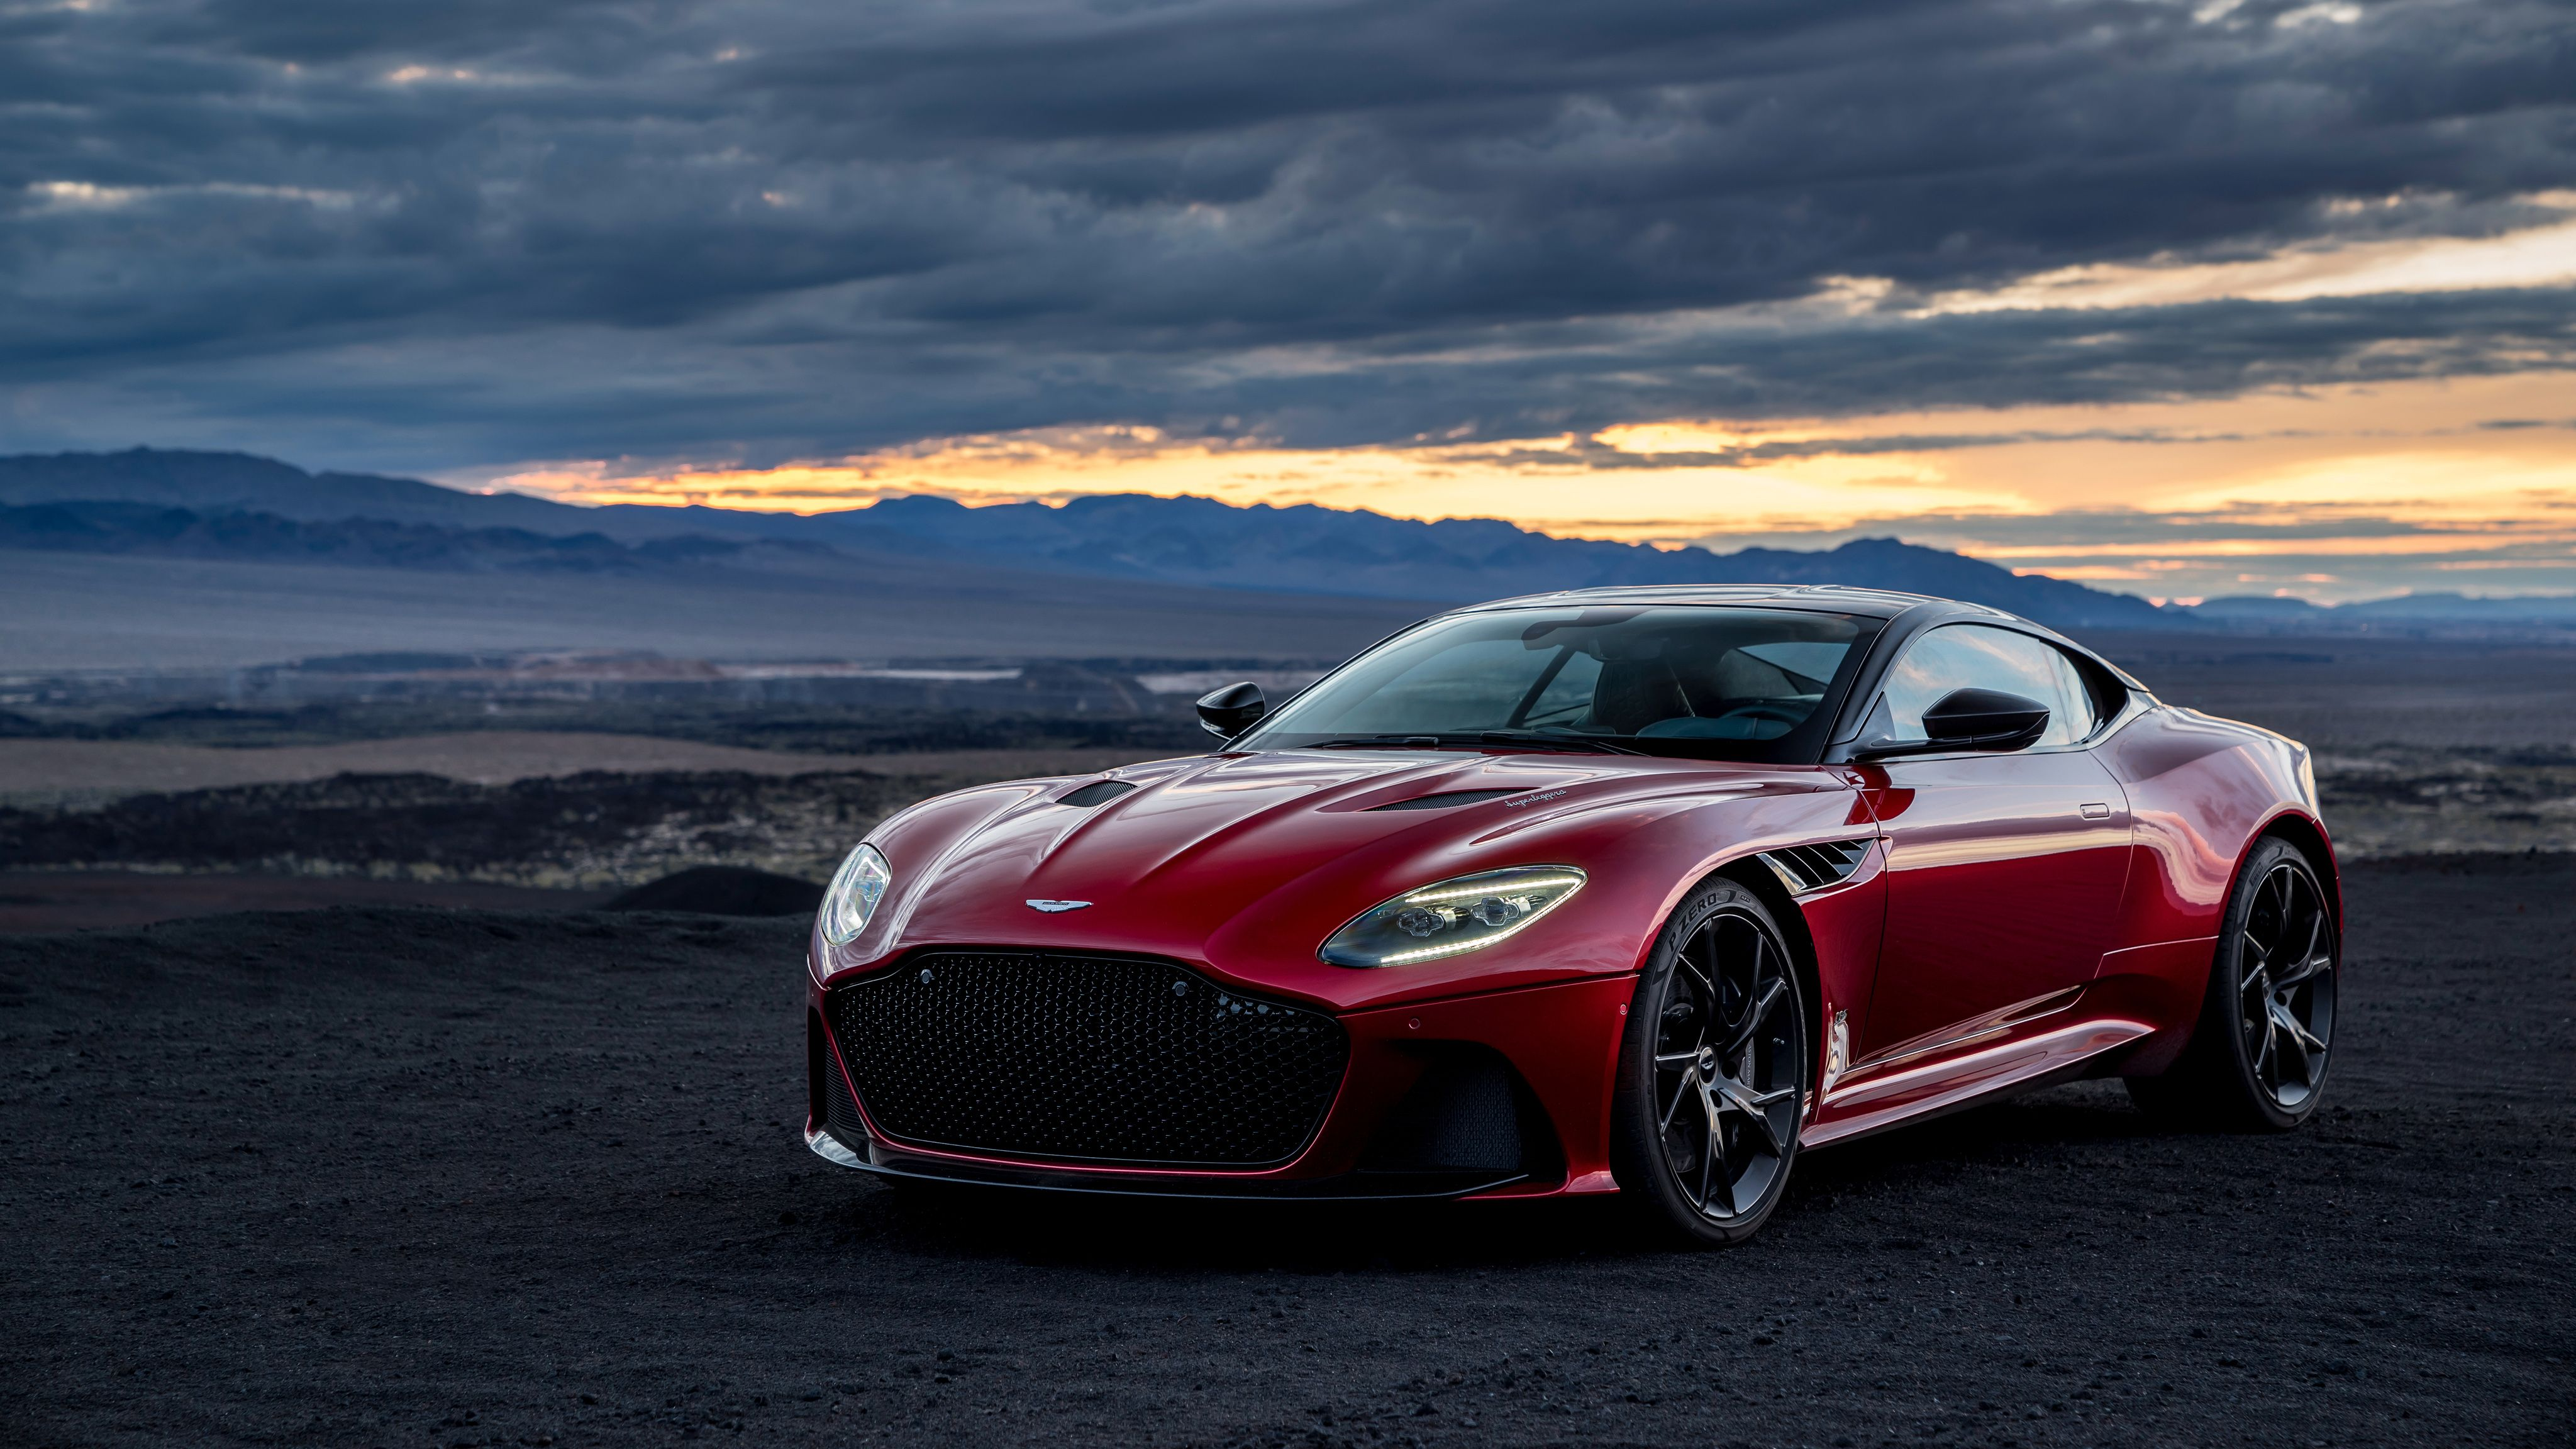 Aston Martin 4k Wallpapers Top Free Aston Martin 4k Backgrounds Wallpaperaccess